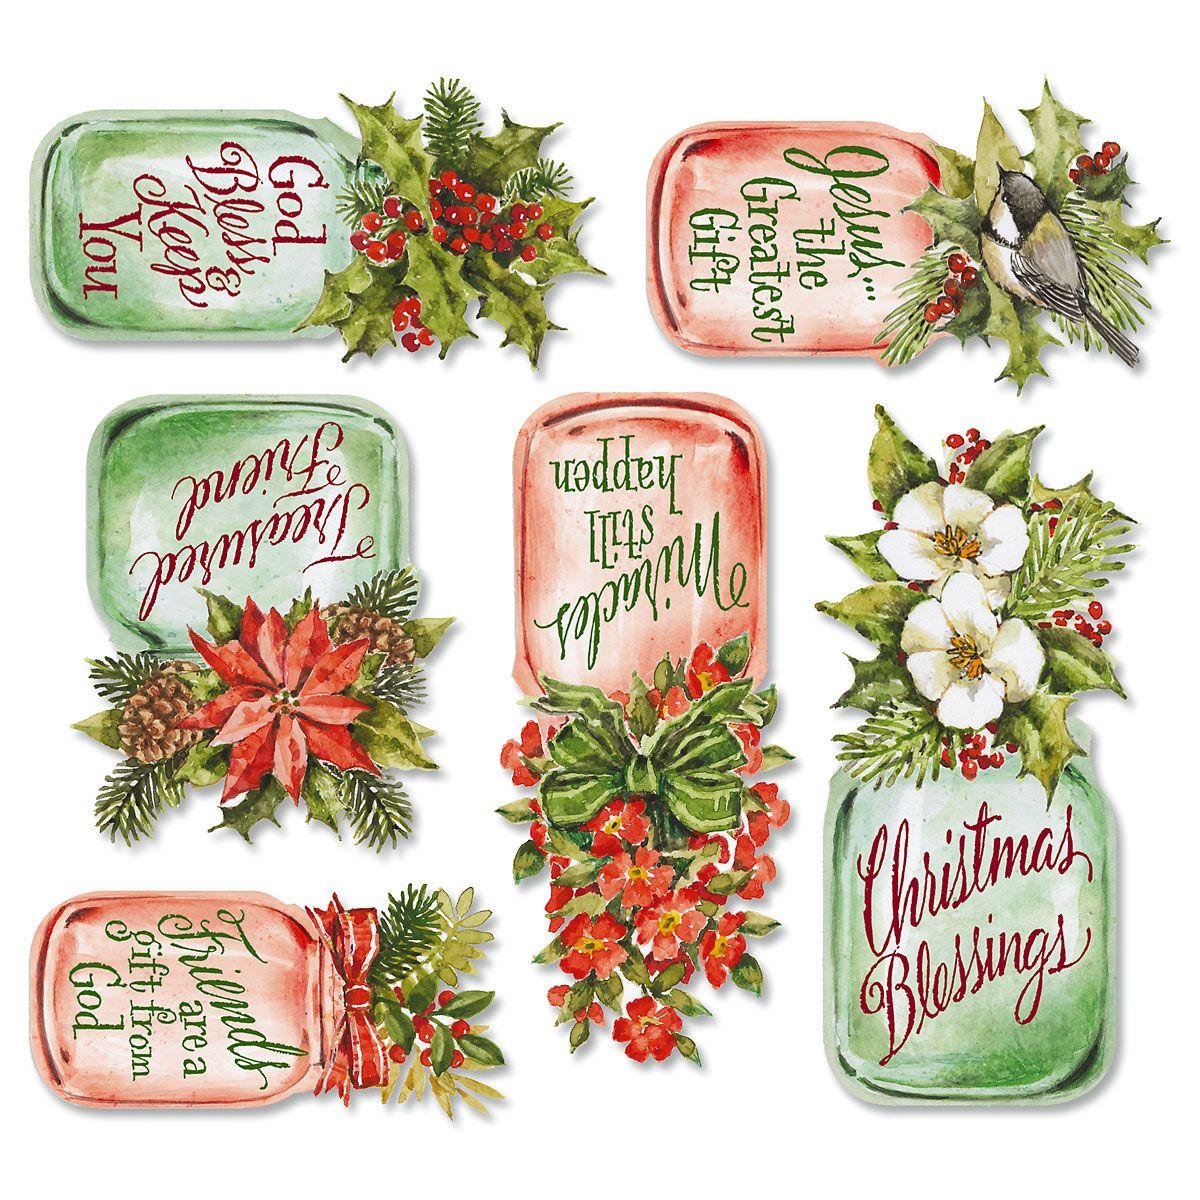 Christmas Mason Jar Magnets Festive holiday bouquet jars feature faith sentiments. Flexible vinyl magnets range from 2 -3 3/4 H. Great stocking stu?ers! Set of 6